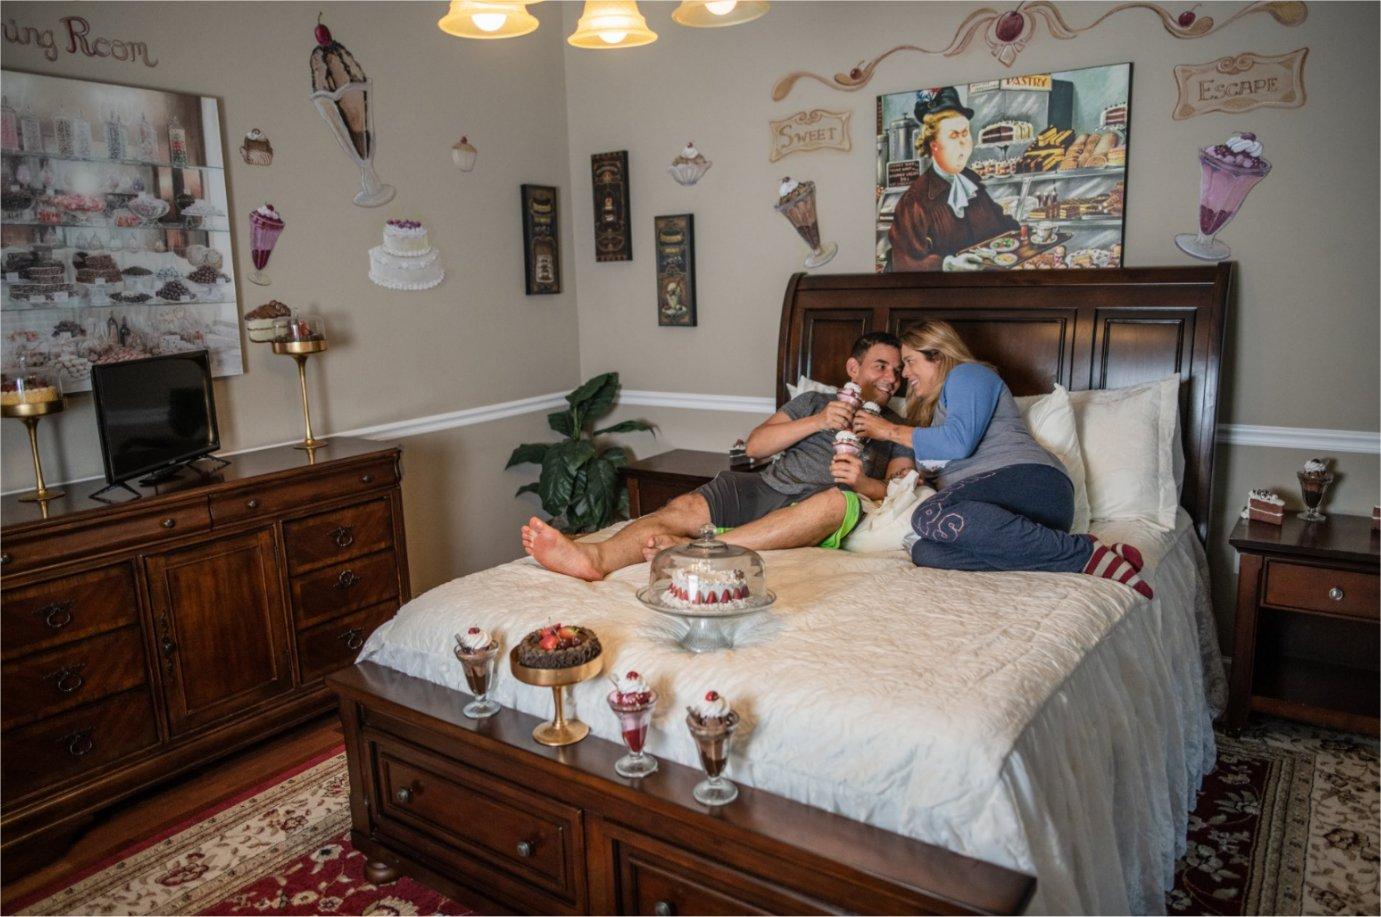 Sweet Escape vacation retreat (Orlando area) - Desserted Dining Room